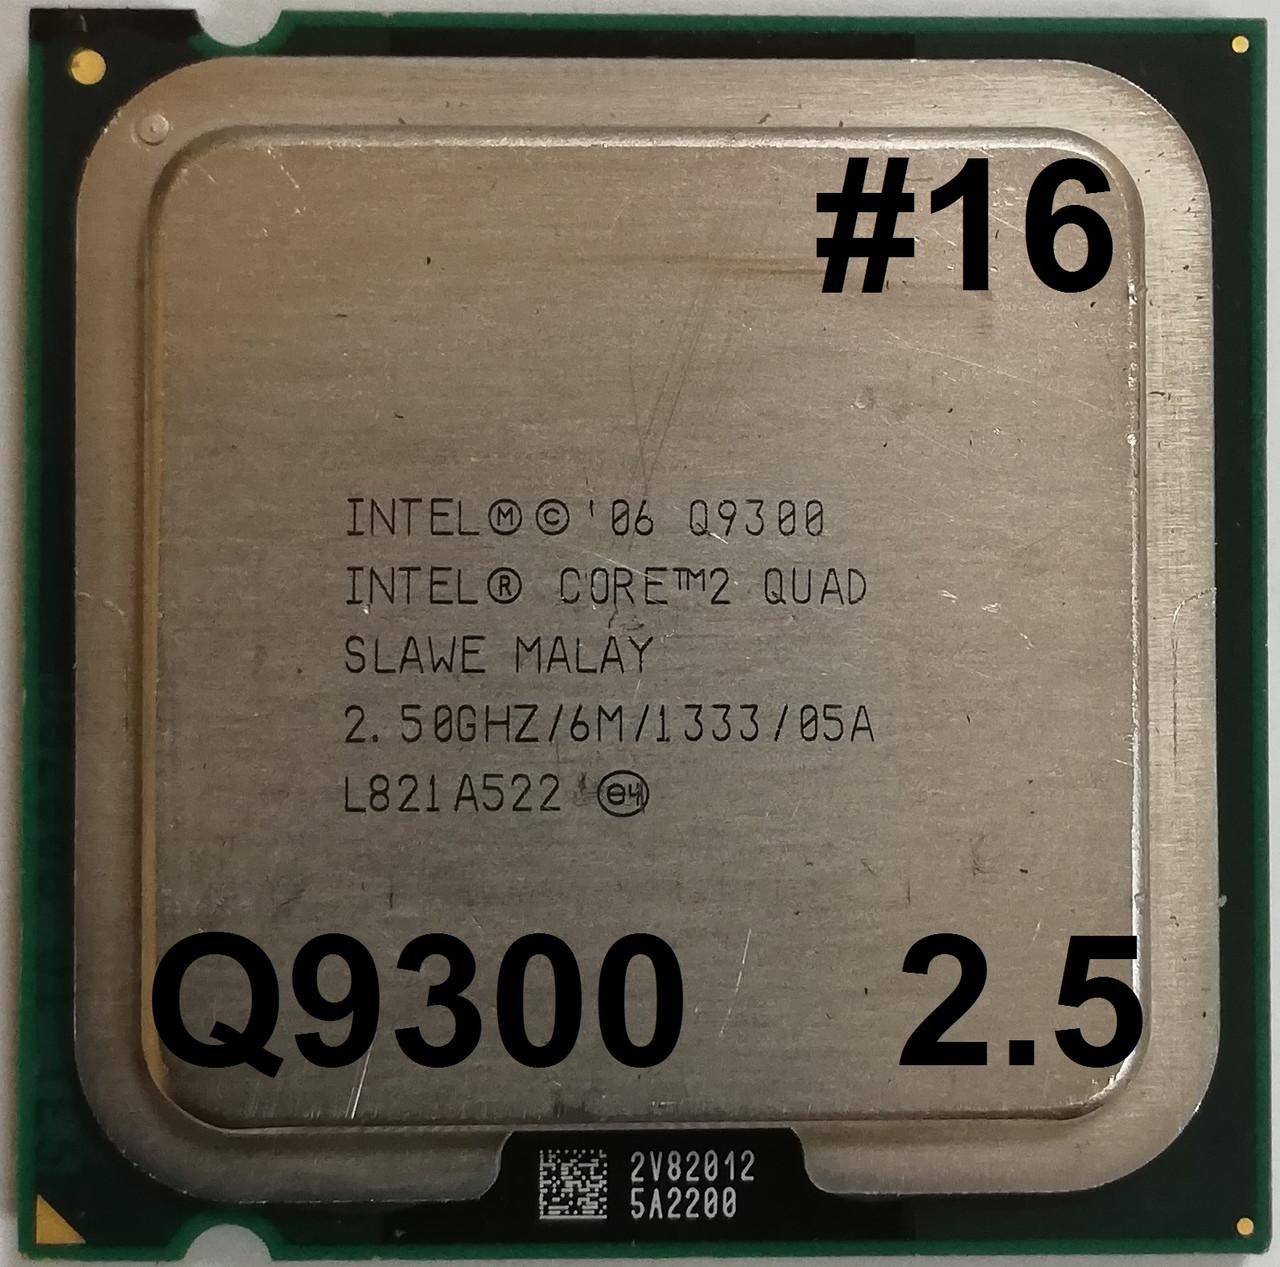 Процессор ЛОТ#16 Intel® Core™2 Quad Q9300 M1 SLAWE 2.5GHz 6M Cache 1333 MHz FSB Socket 775 Б/У